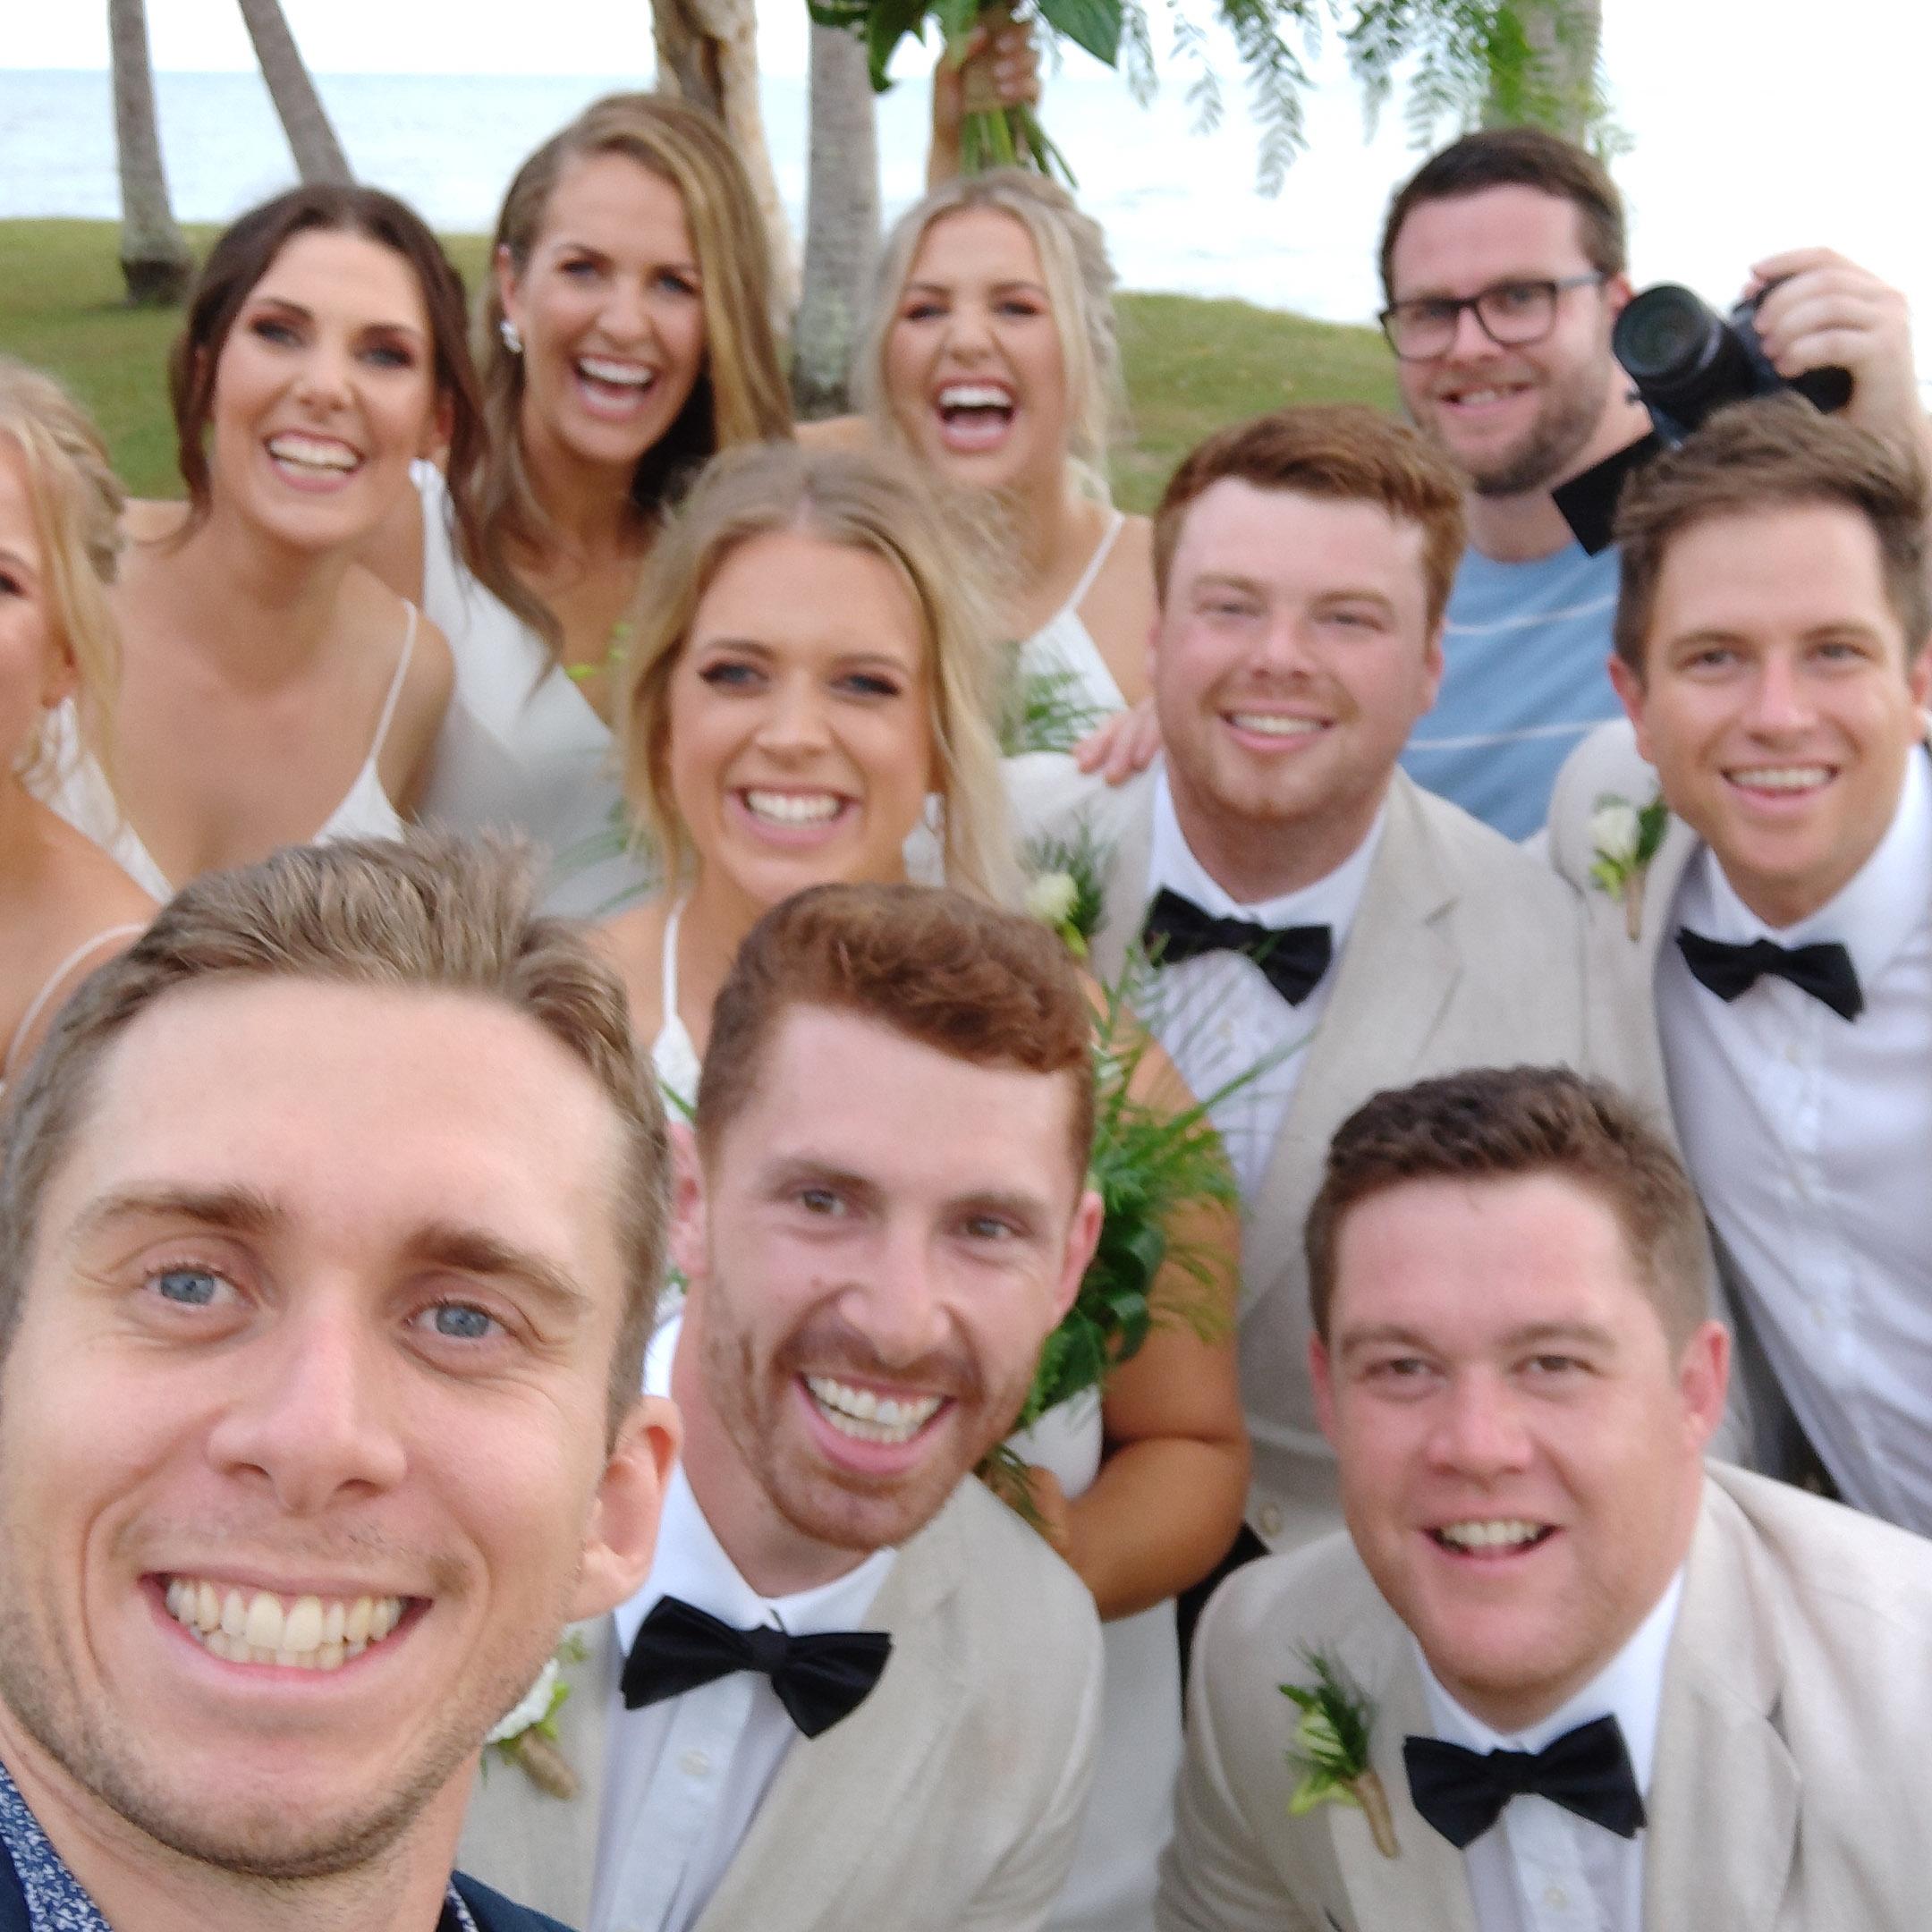 The-raw-photographer-cairns-wedding-photography-bridalparty-selfie-11.jpg